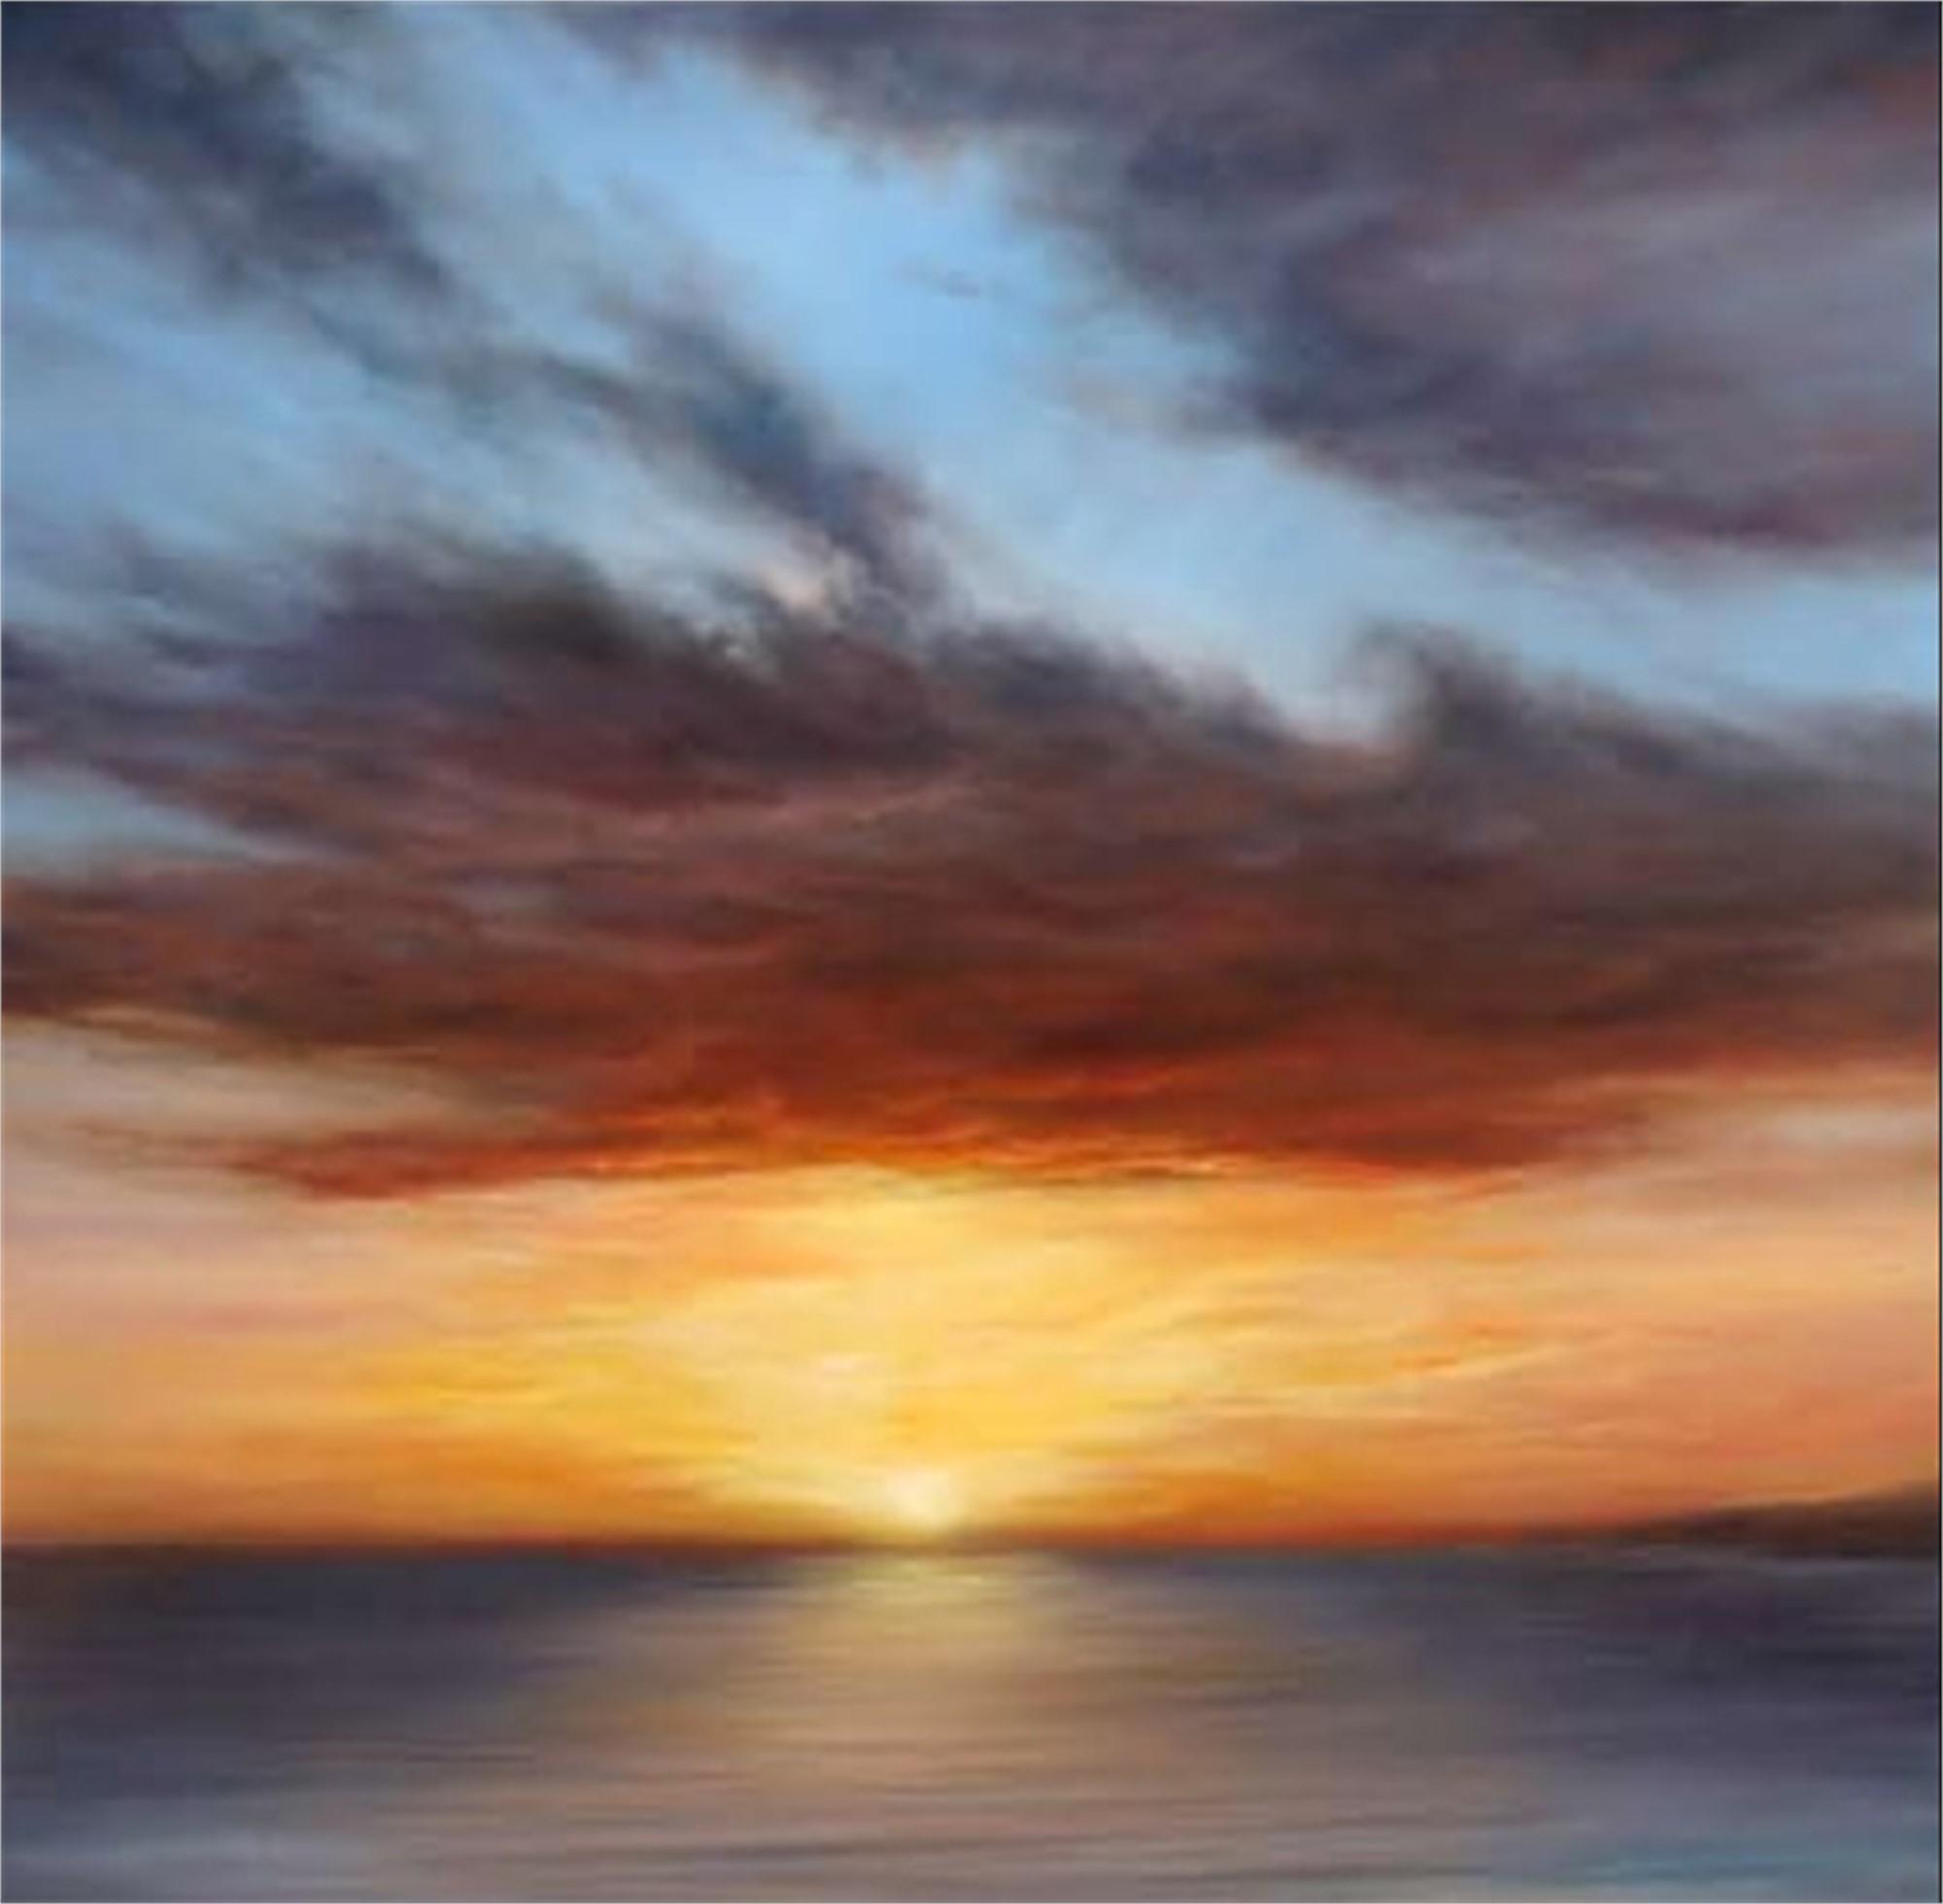 Beyond the Horizon (SN) by Cheryl Kline